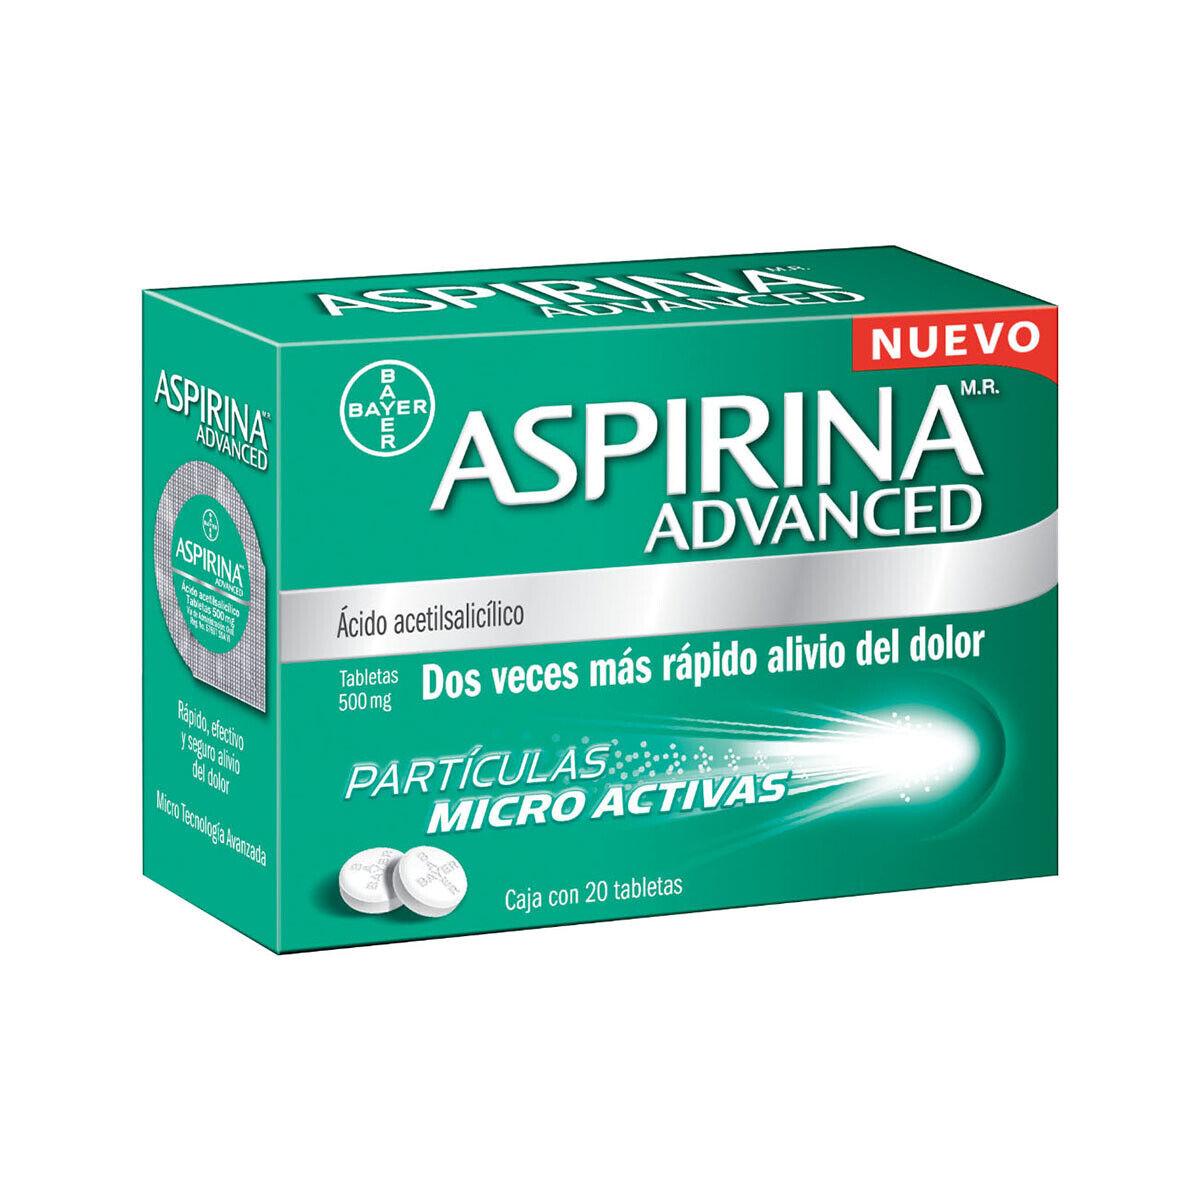 Aspirina / Aspirin Advanced 500 mg -20 tablets